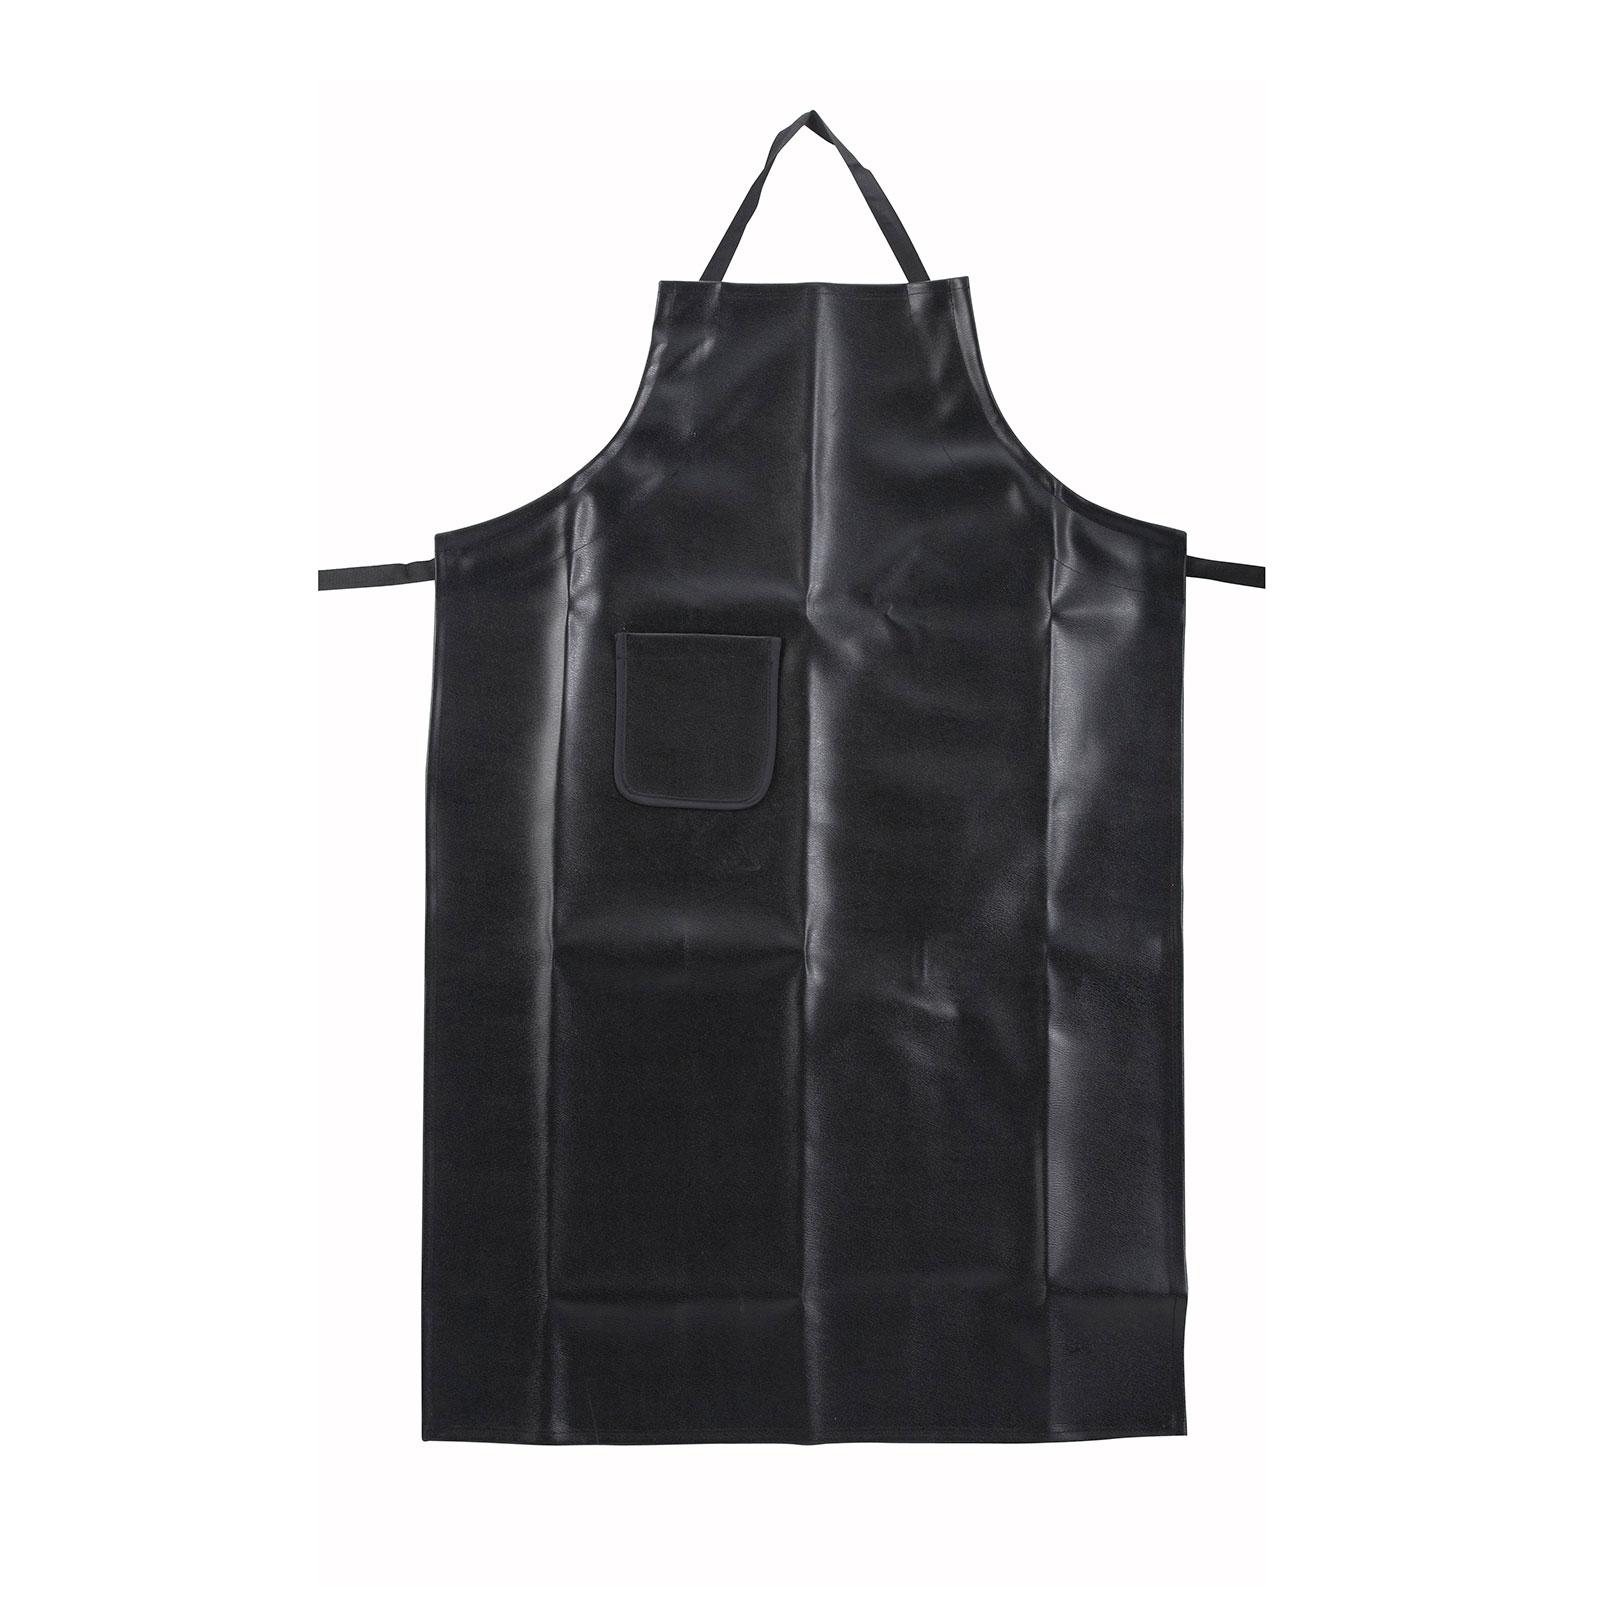 Winco BA-HN bib apron